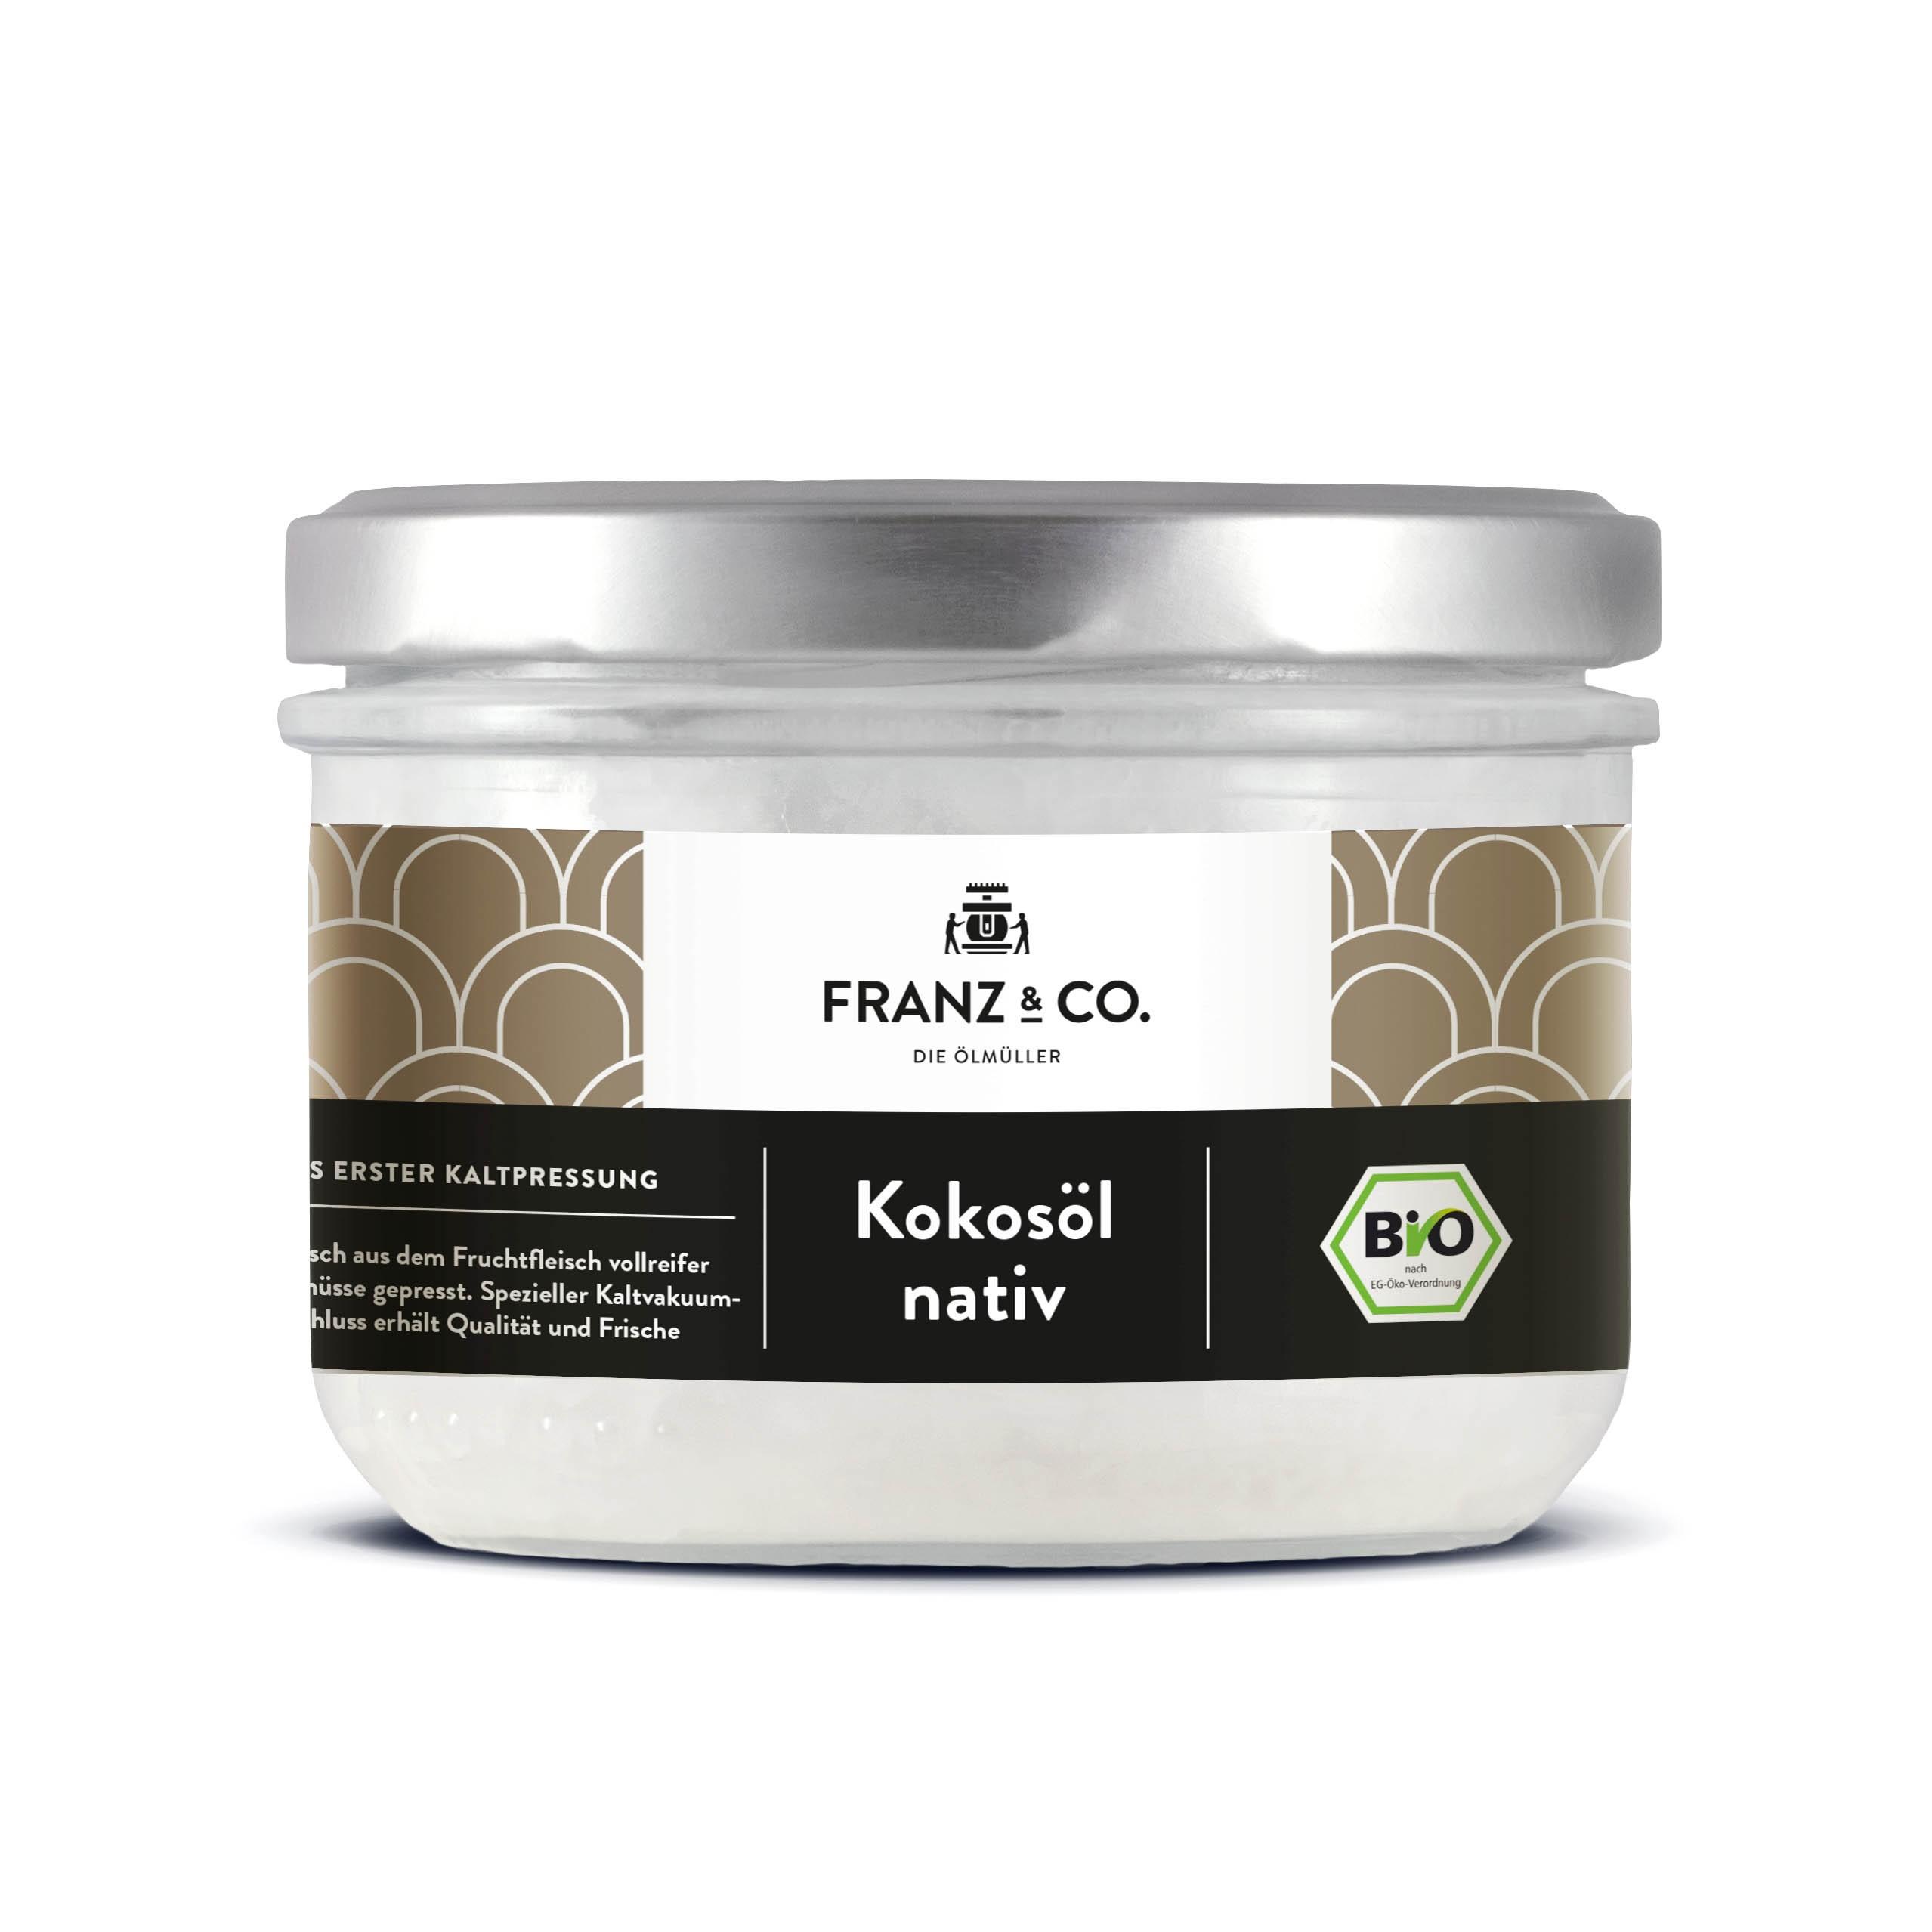 Franz & Co BIO Kokosöl nativ 200ml